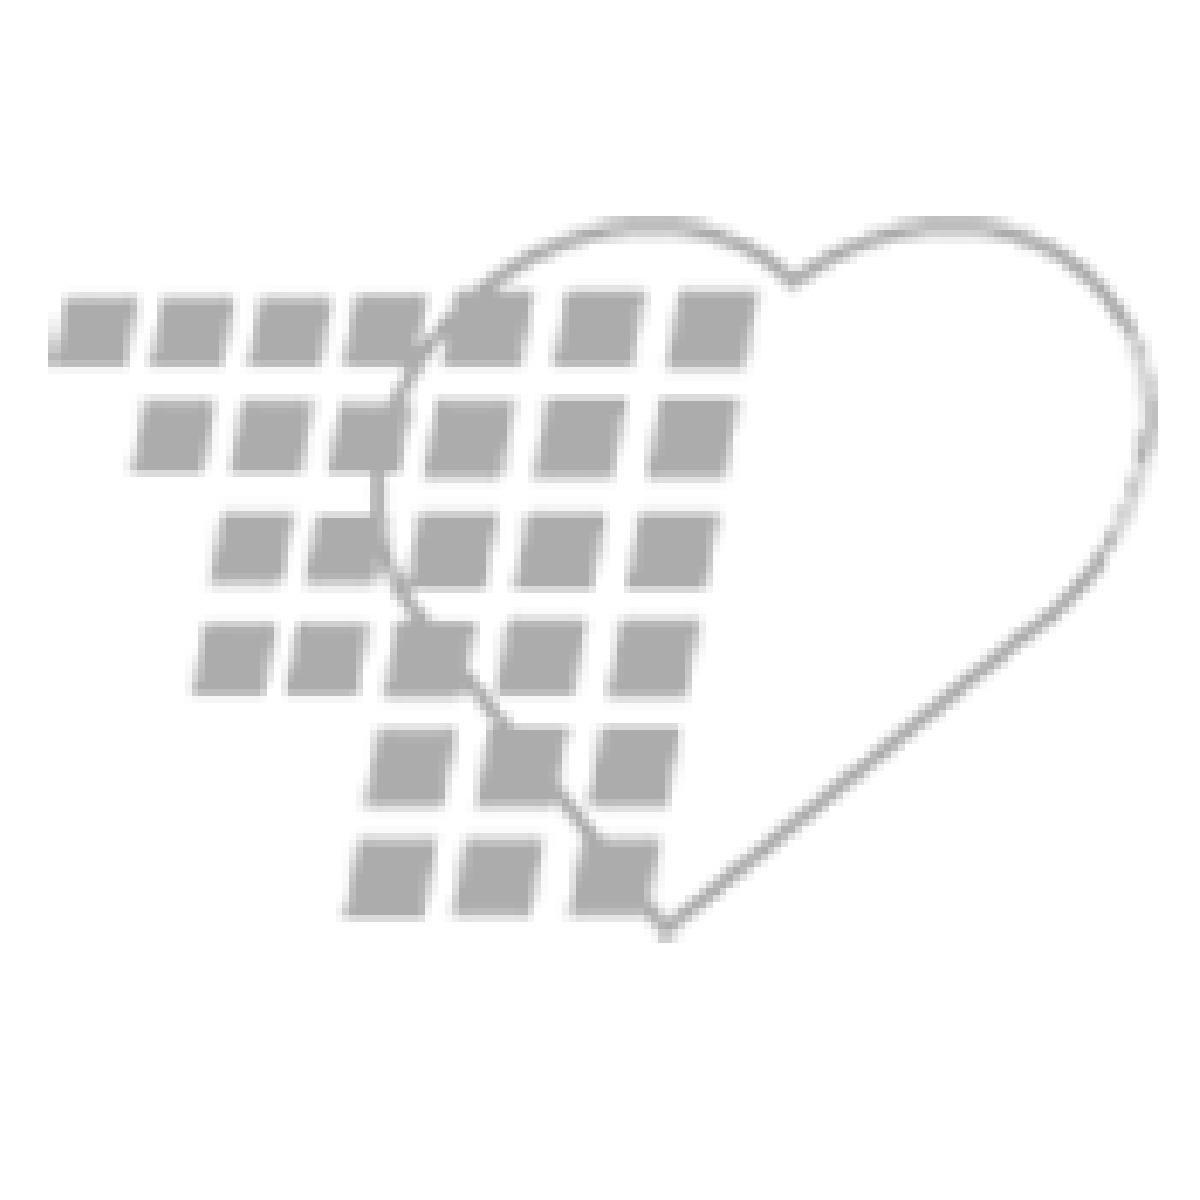 02-40-4151P Sonotrax Pro Fetal Doppler with 8 Mhz Probe